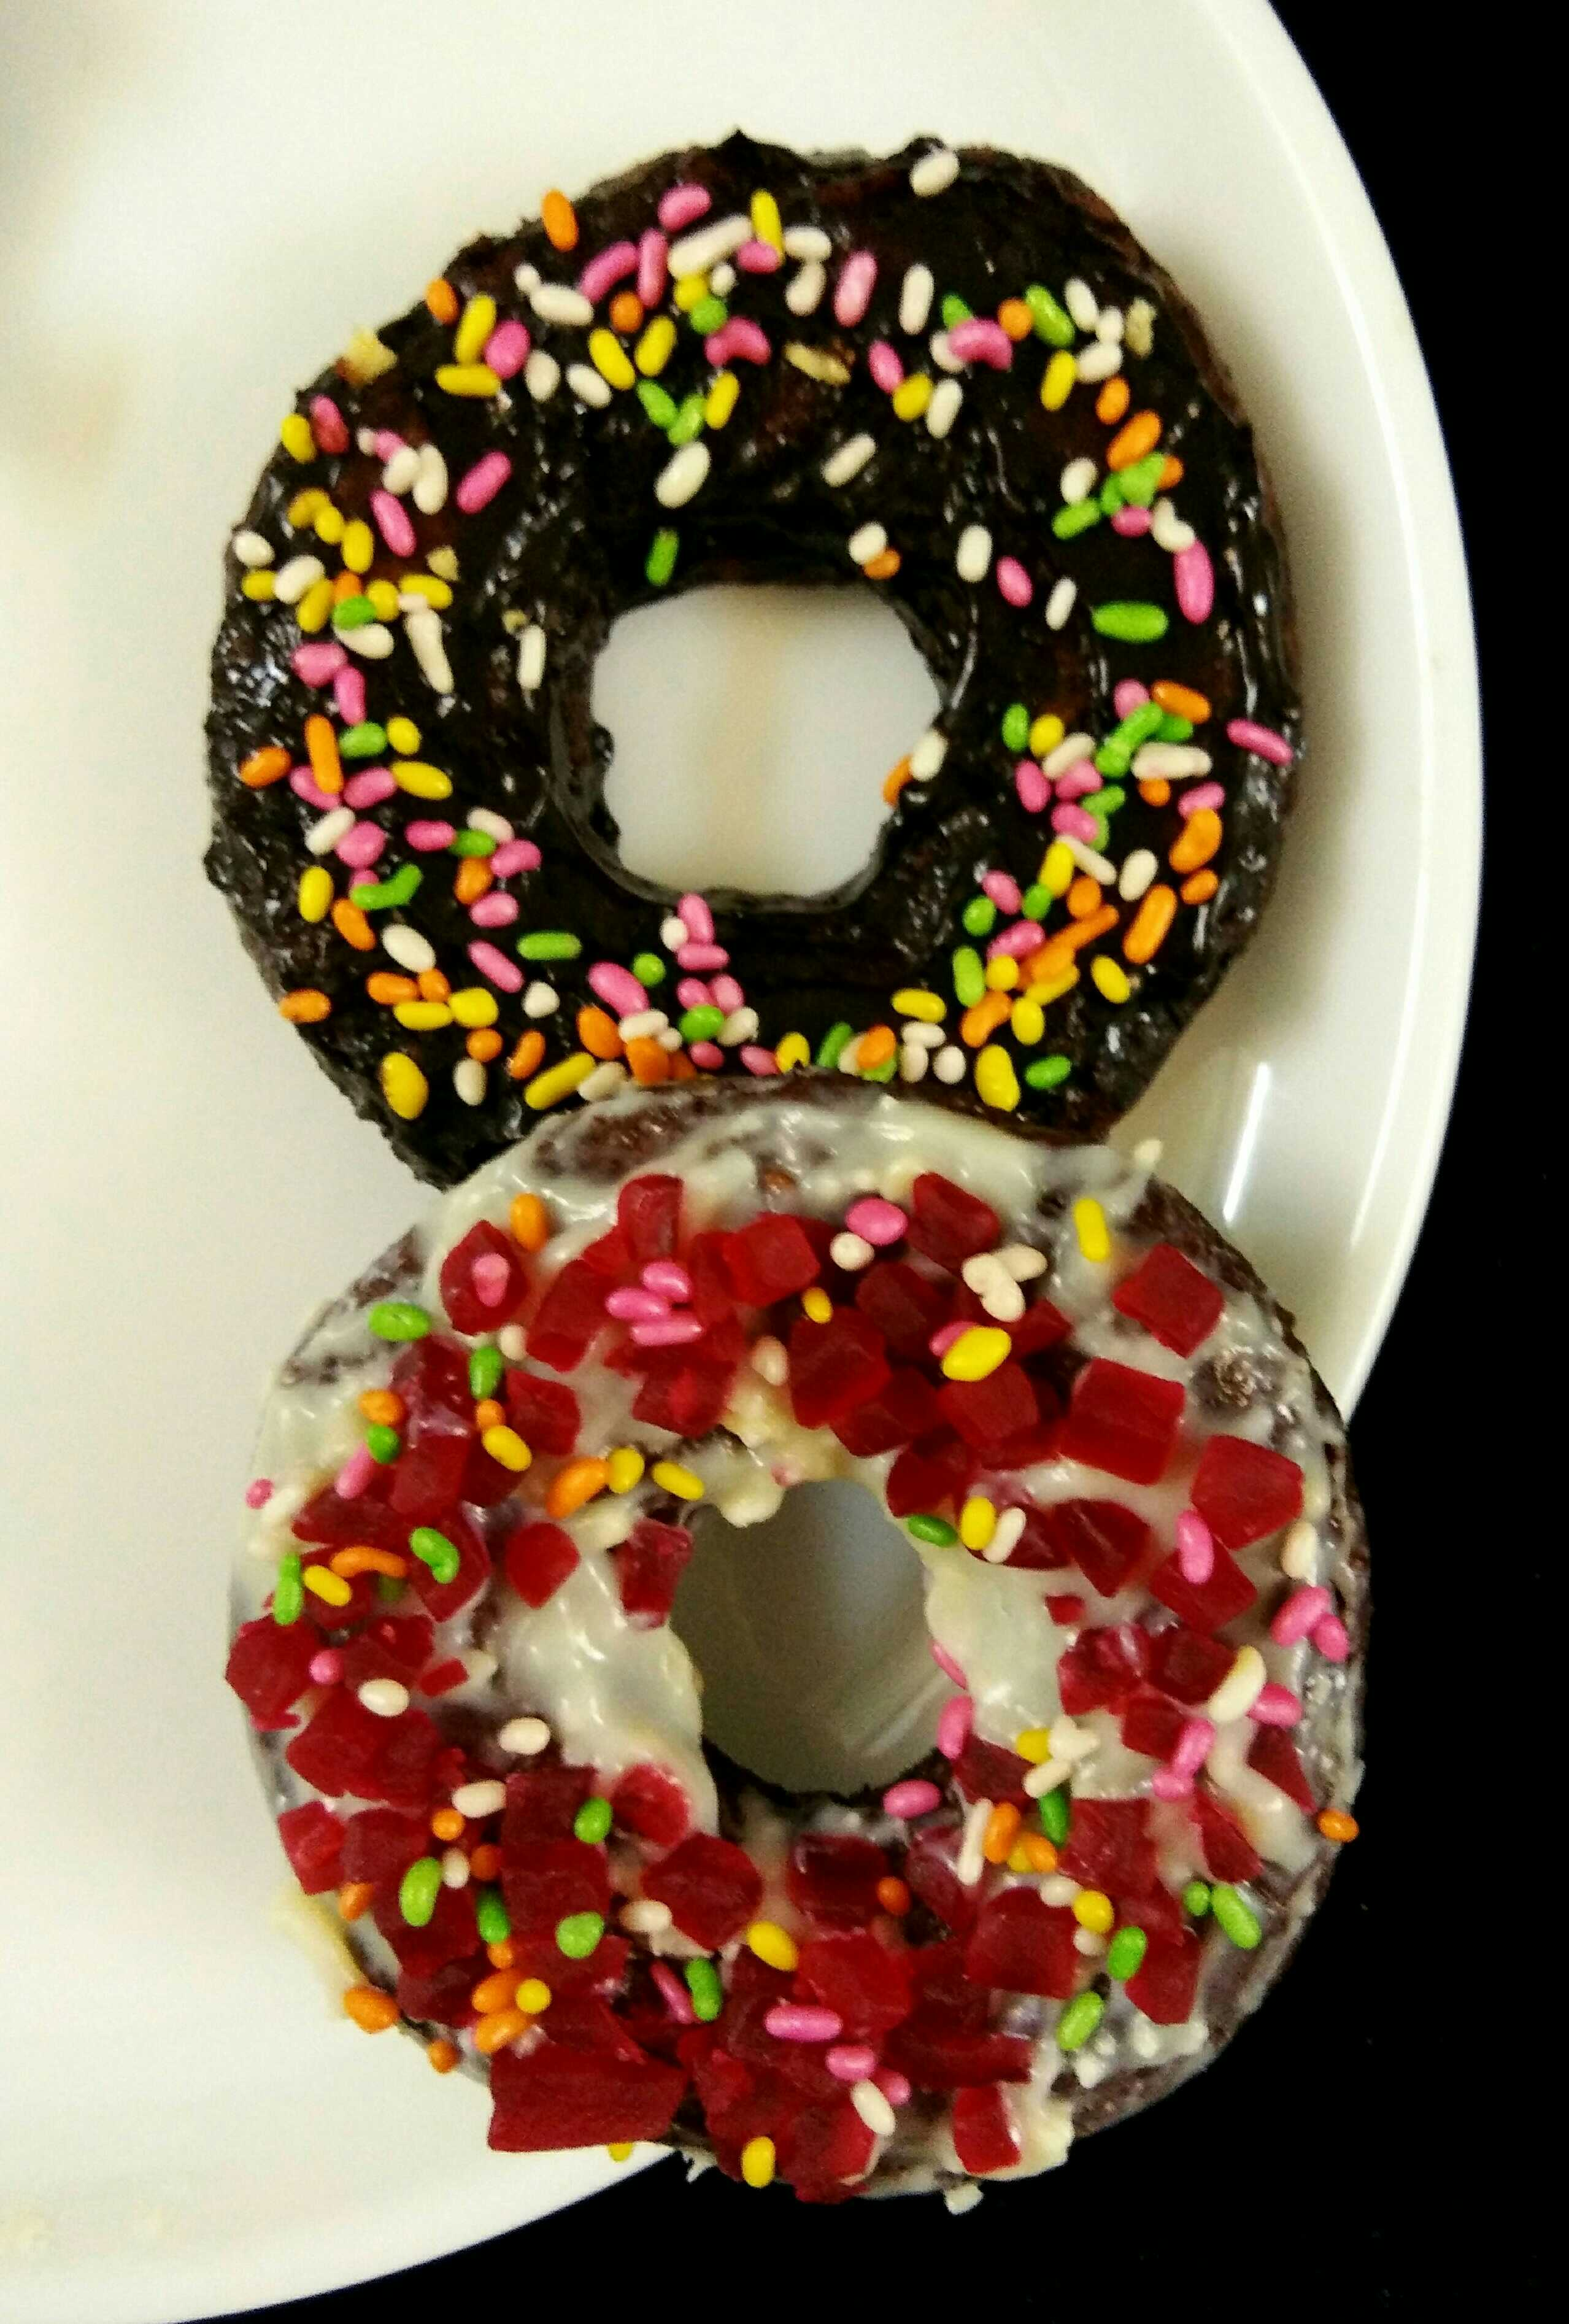 Healthy Doughnuts